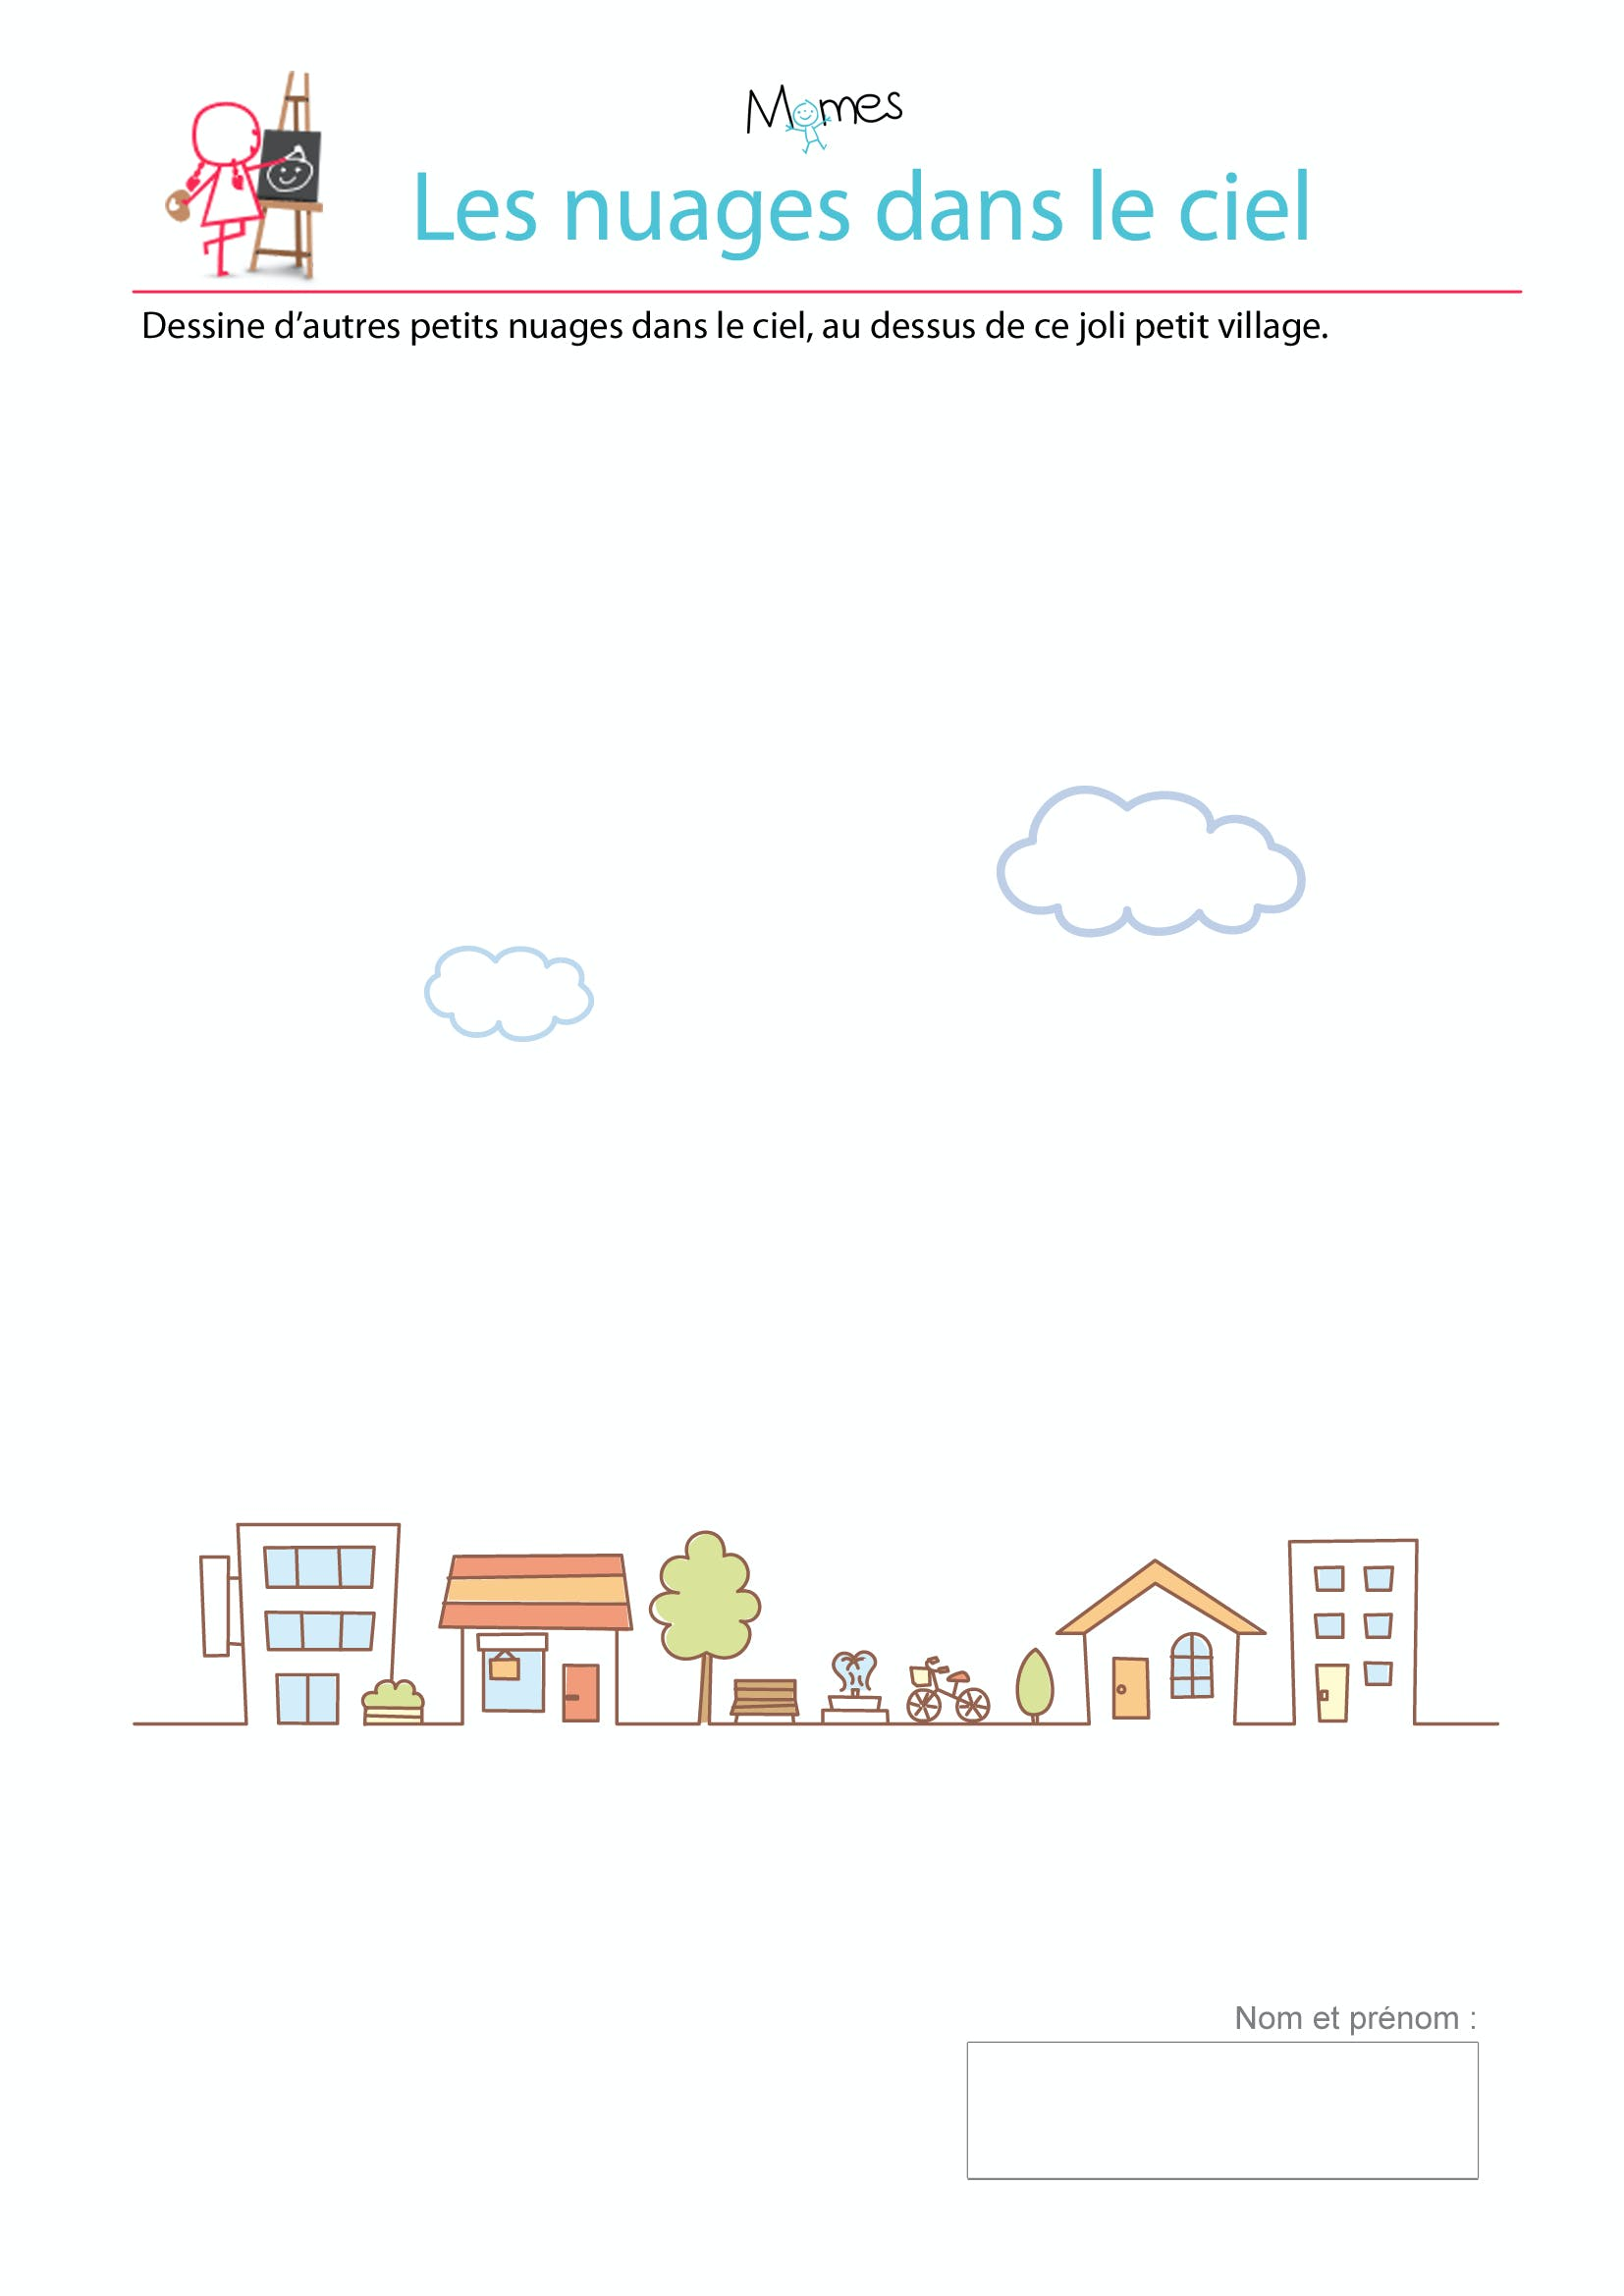 exercice dessin nuage - Dessin De Nuage